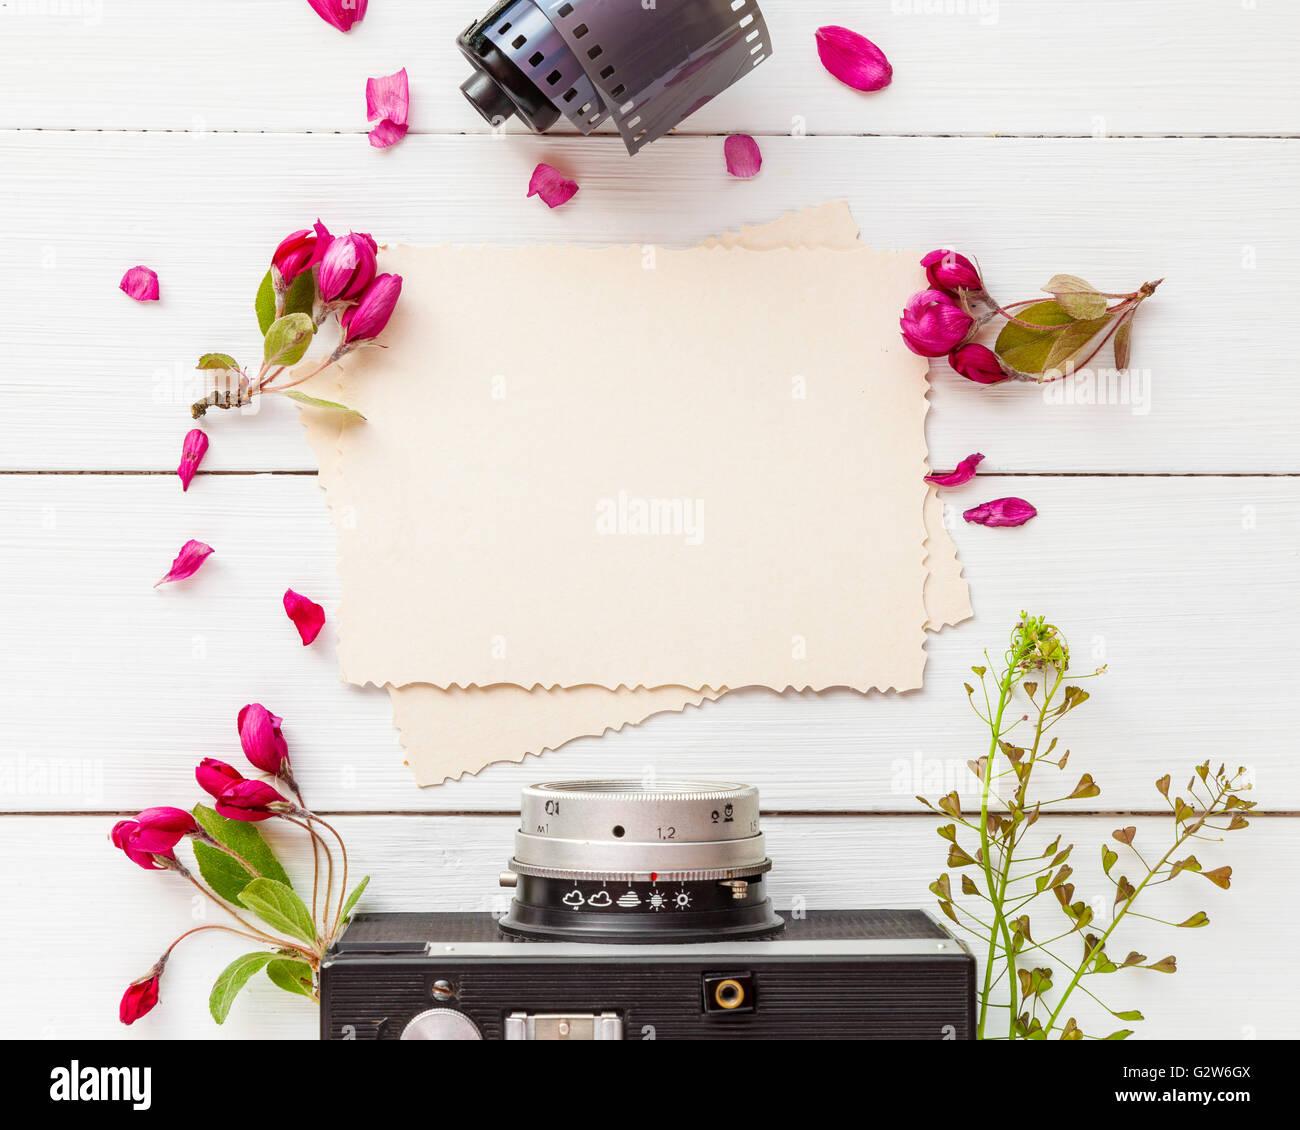 gro hausgemachte bilderrahmen galerie bilderrahmen ideen. Black Bedroom Furniture Sets. Home Design Ideas